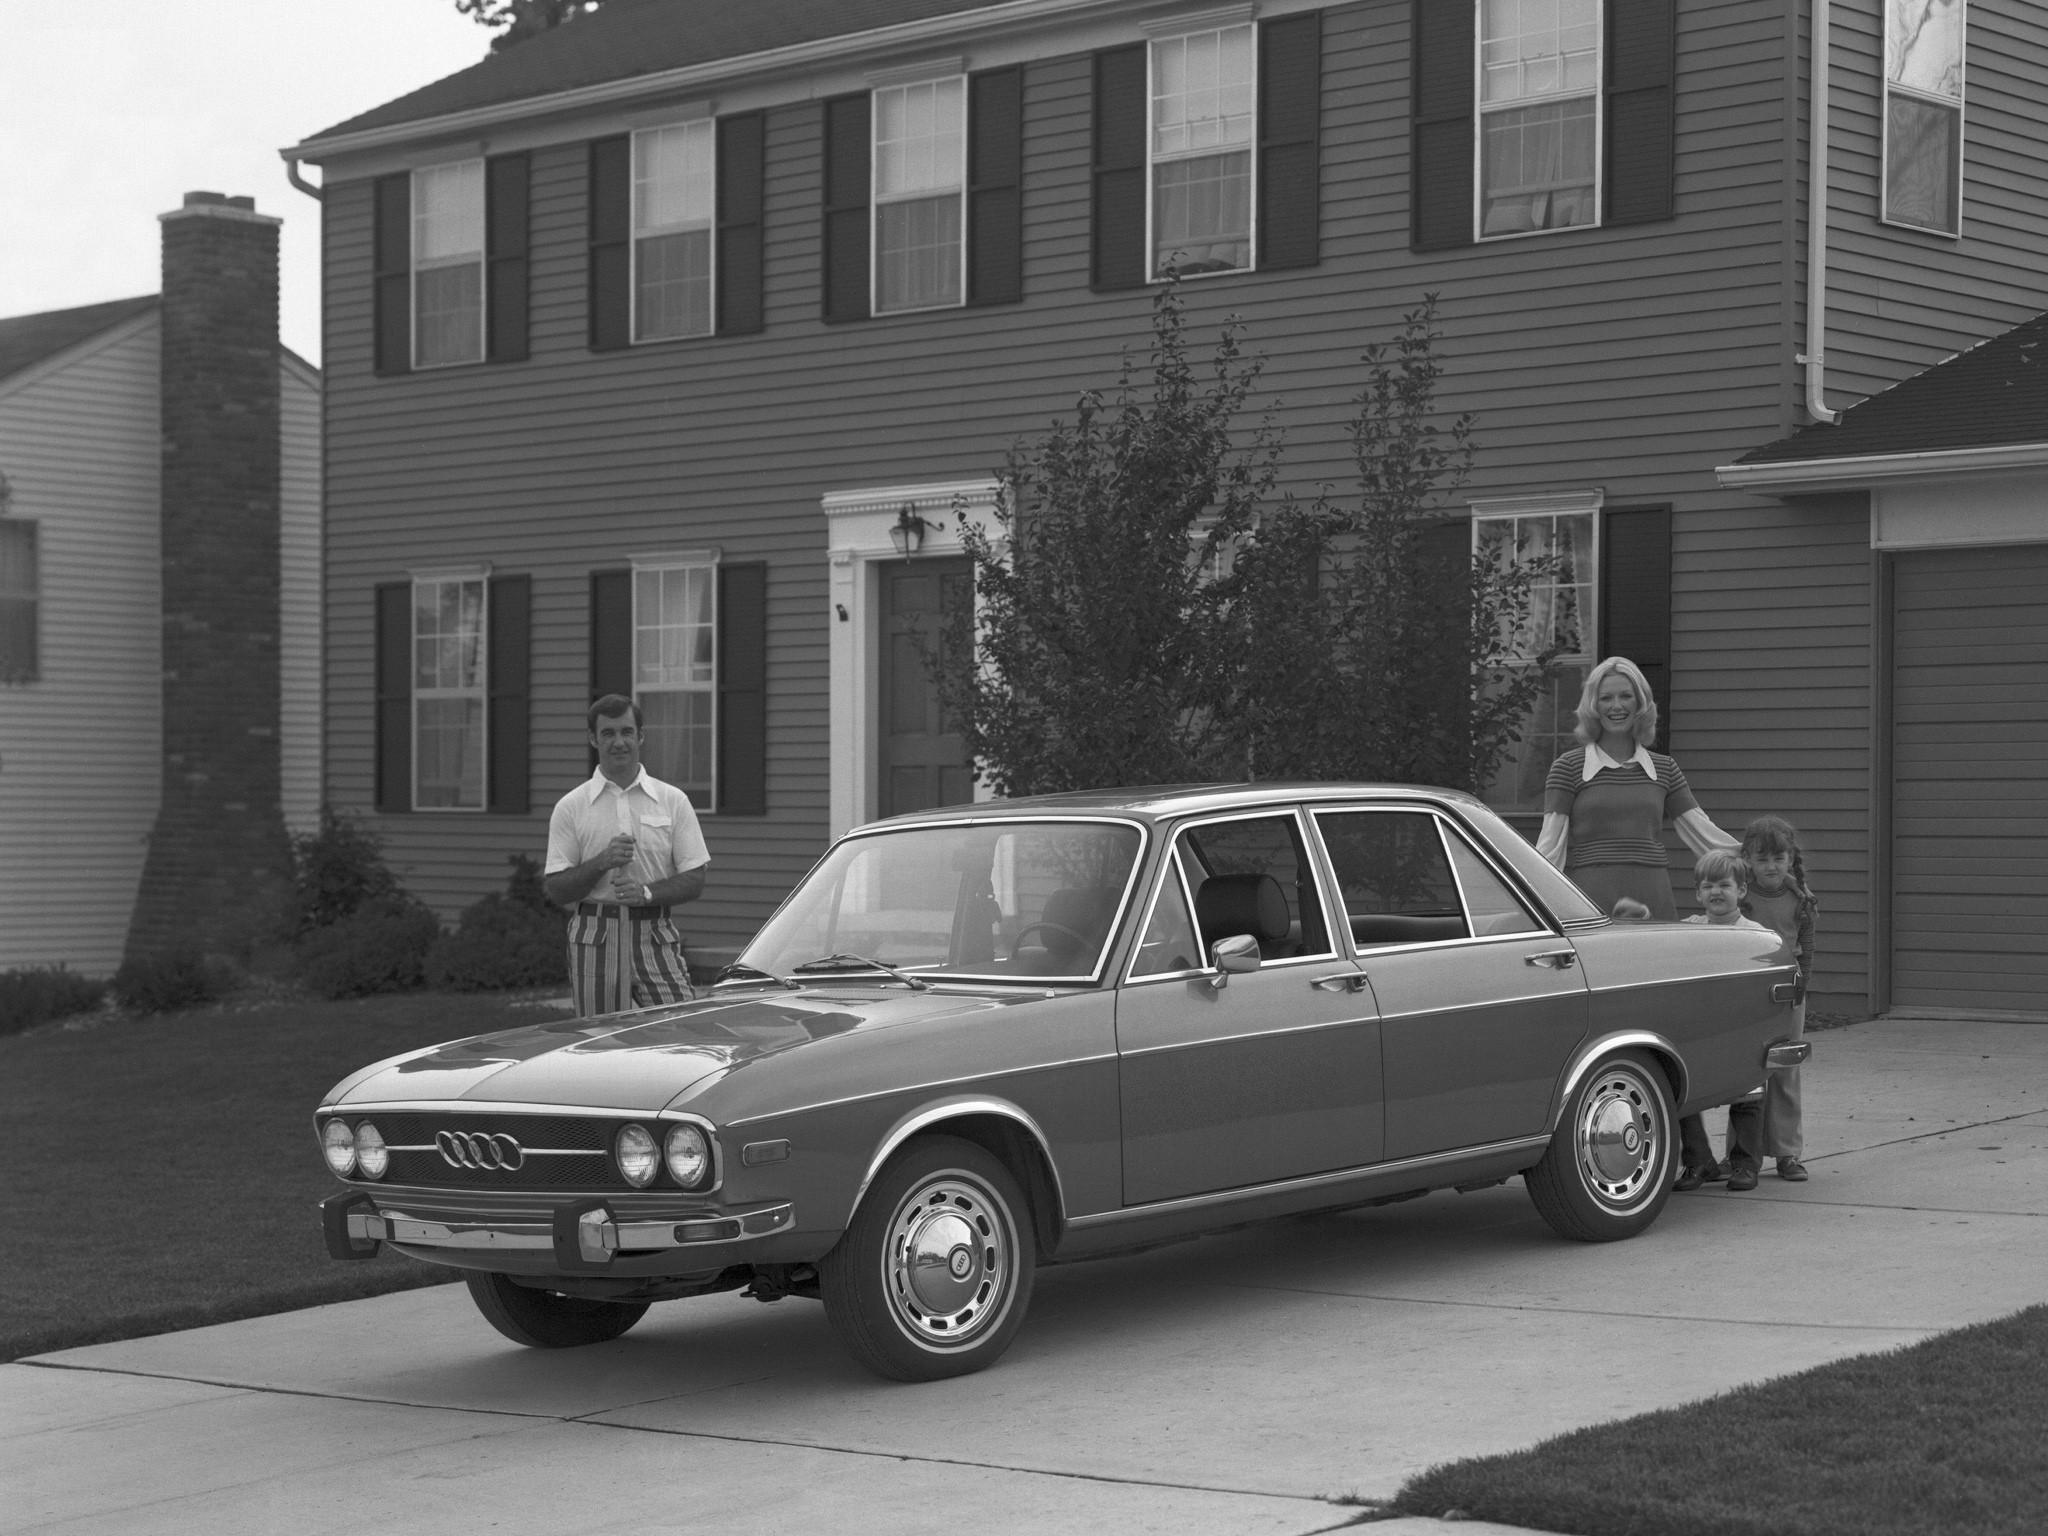 AUDI 100 (C1) - 1968, 1969, 1970, 1971, 1972, 1973, 1974, 1975, 1976 - autoevolution